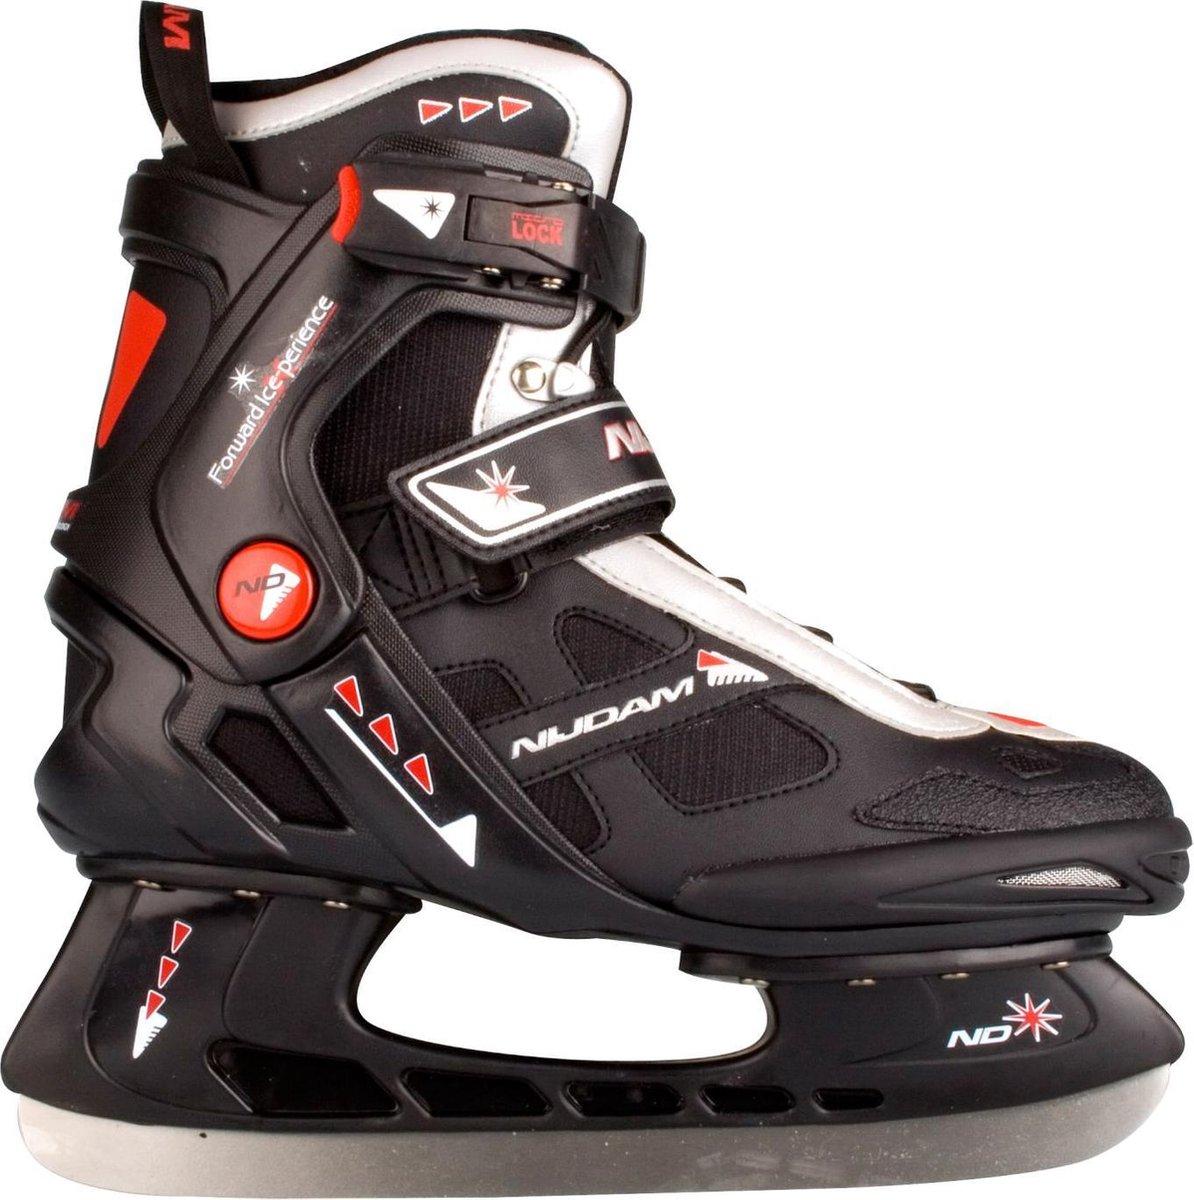 Nijdam 3353 Ijshockeyschaats - Semi-Softboot - Zwart/Oranje - Maat 39